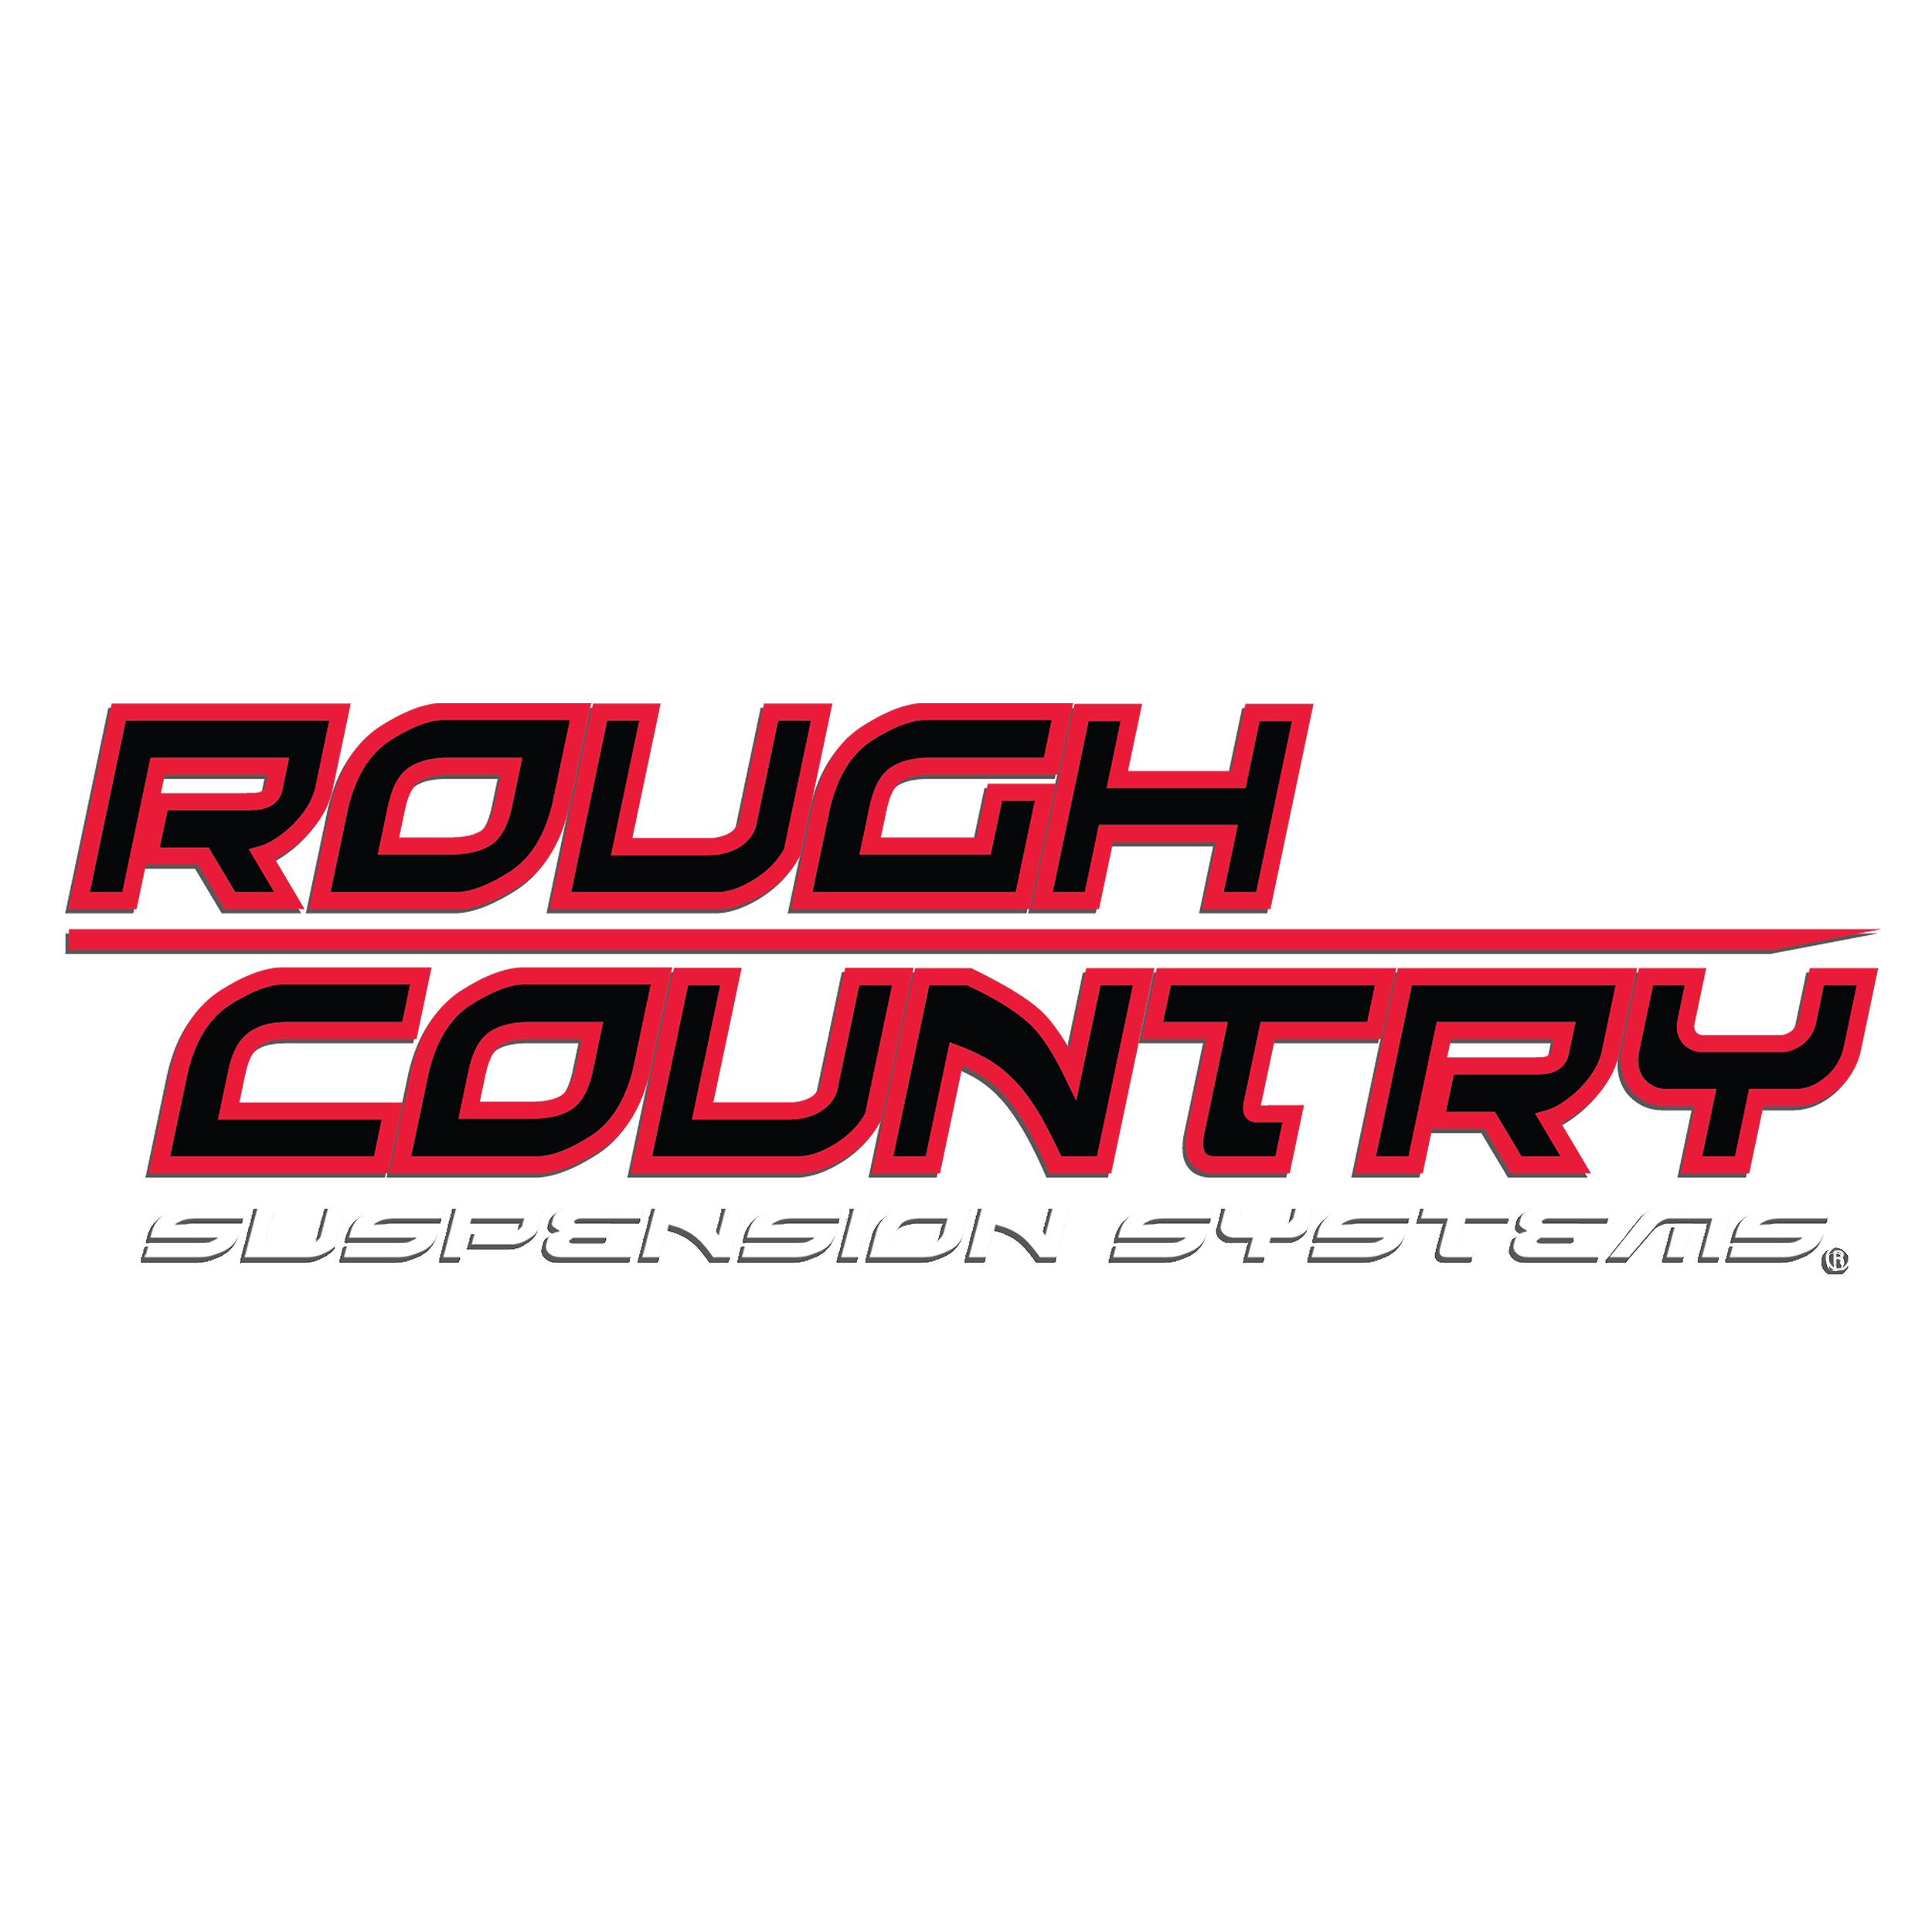 Rough Country Square Logo.jpg